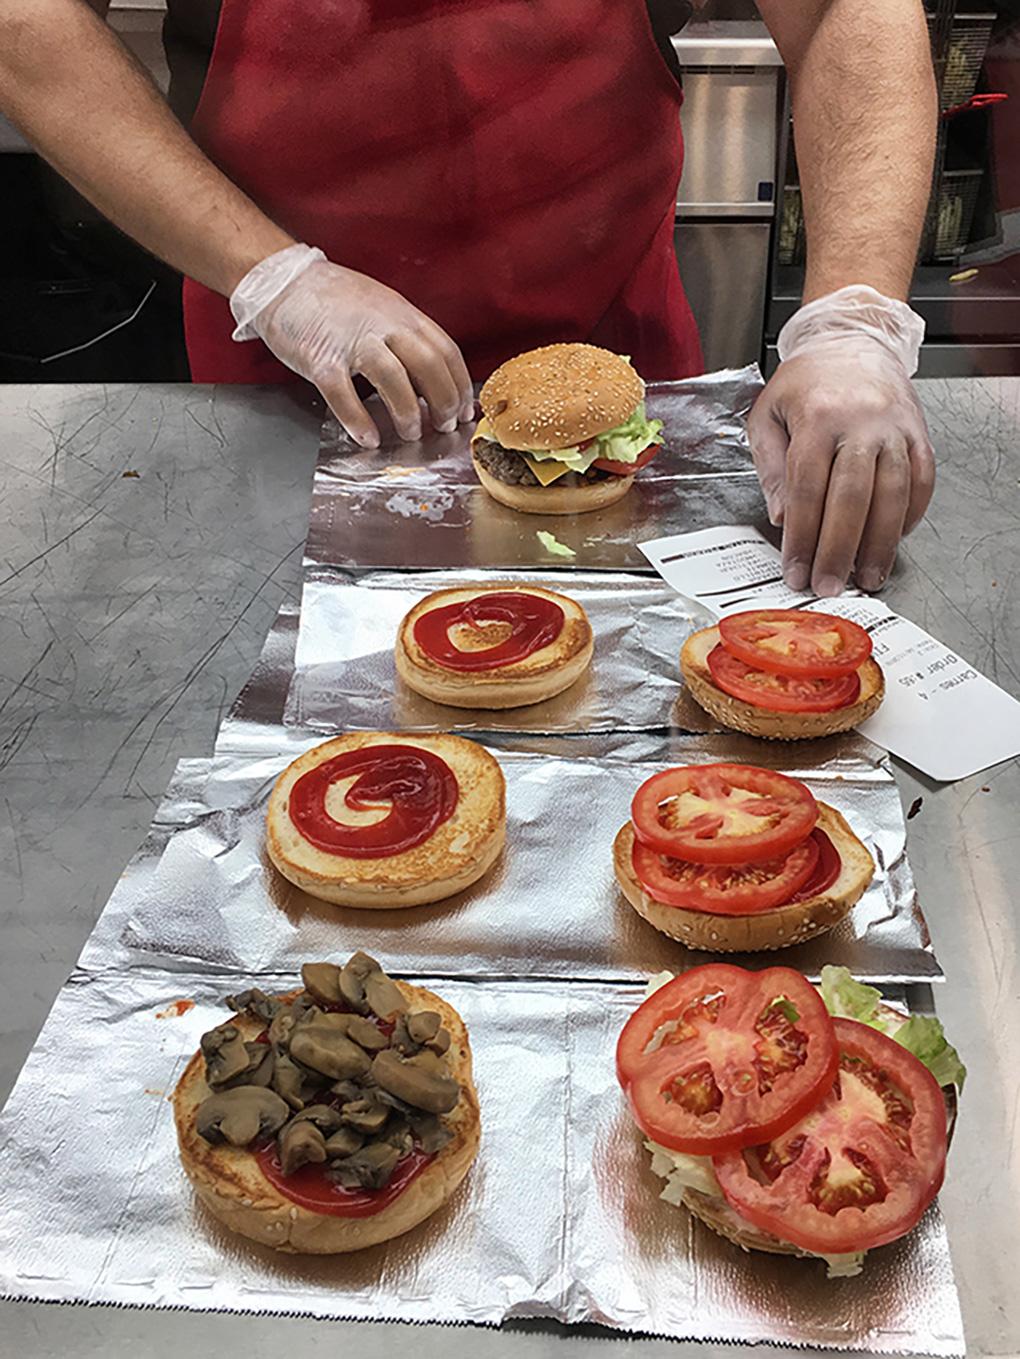 Las hamburguesas, listas para montar.